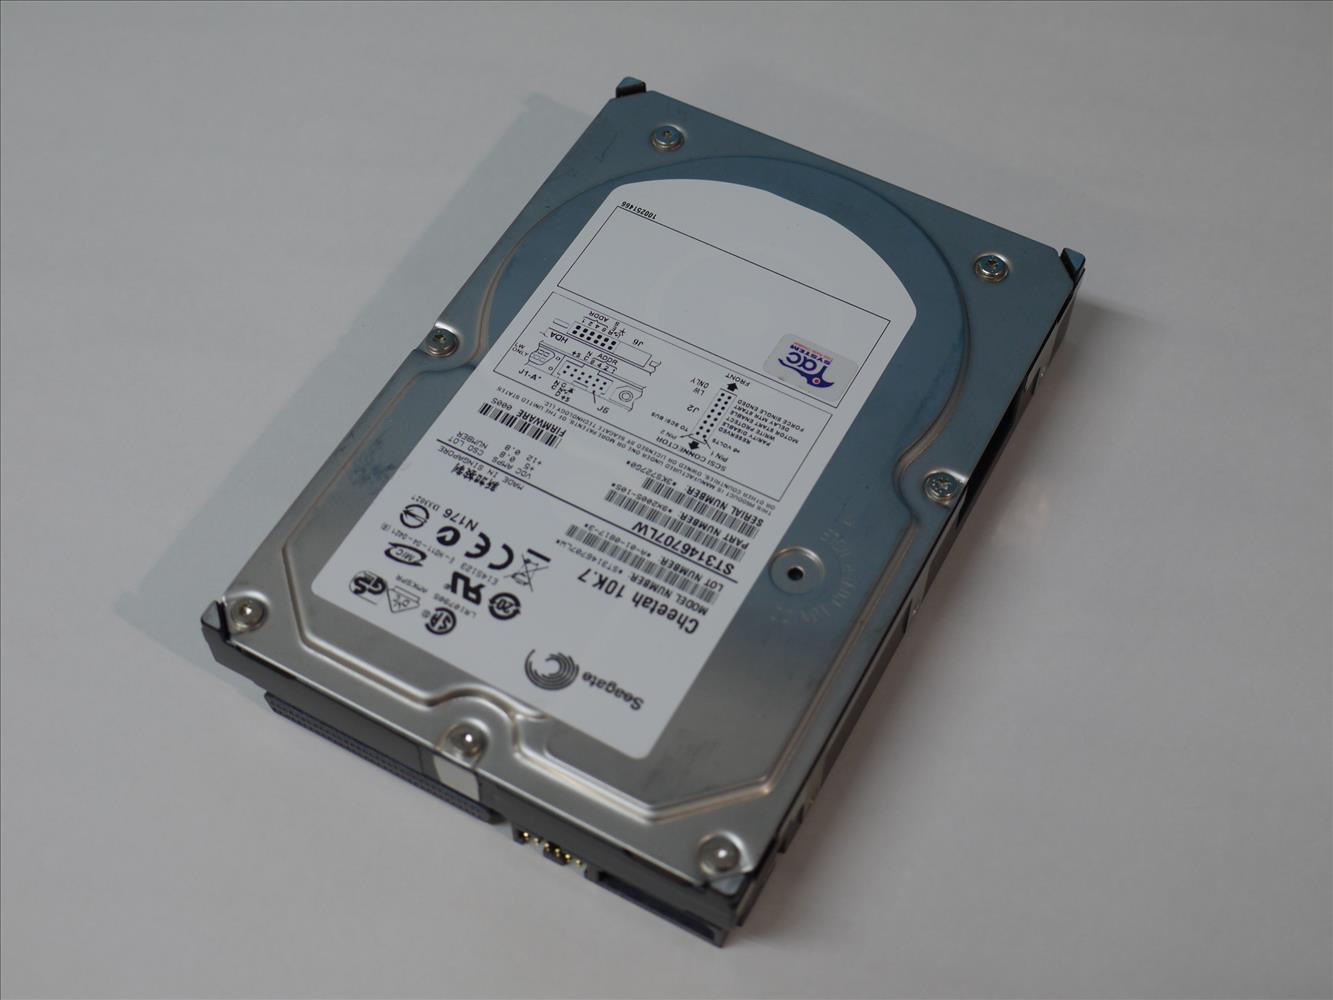 Seagate ST3146707LW 146GB 10000rpm 3.5インチ Ultra-320 SCSI 68Pin 【中古】【送料無料セール中! (大型商品は対象外)】